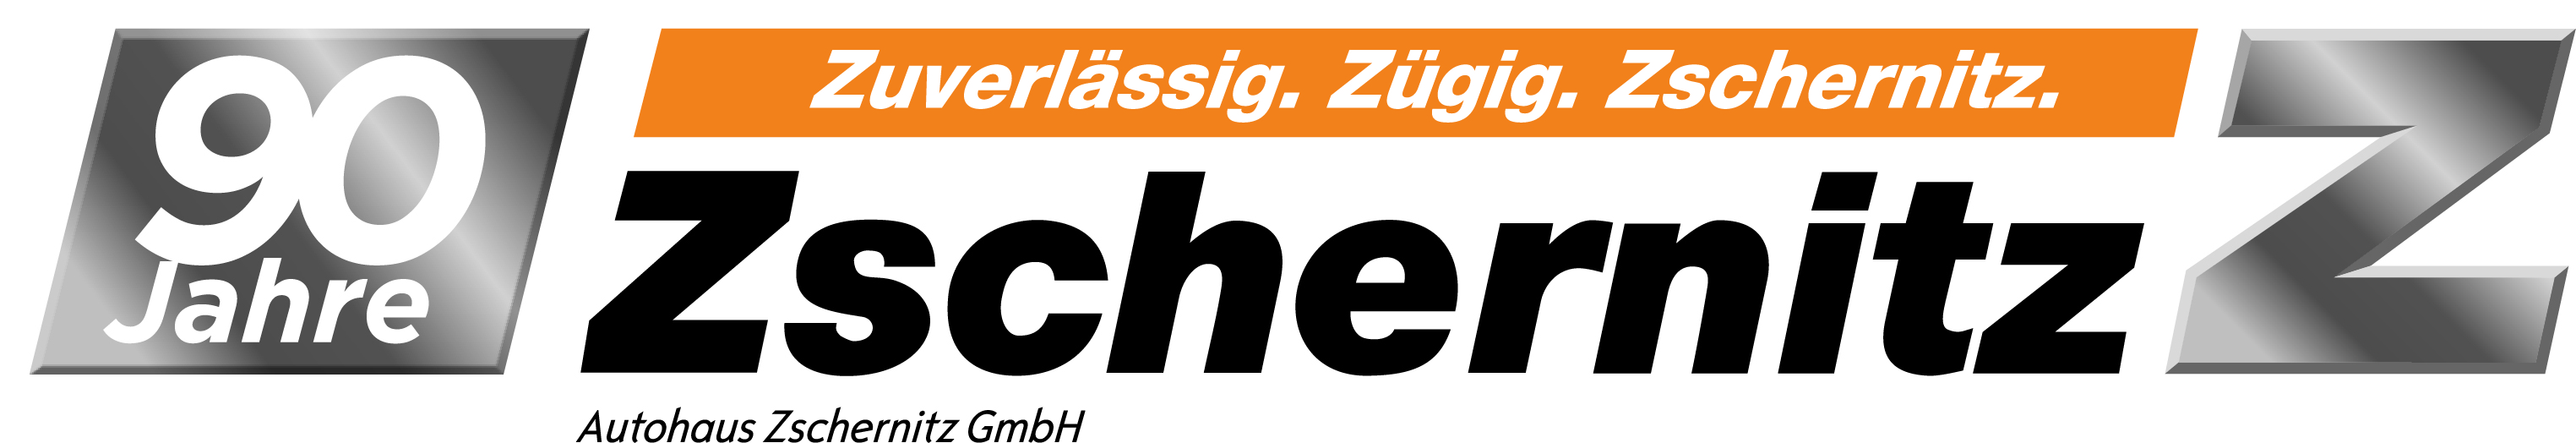 Zschernitz Karlsruhe